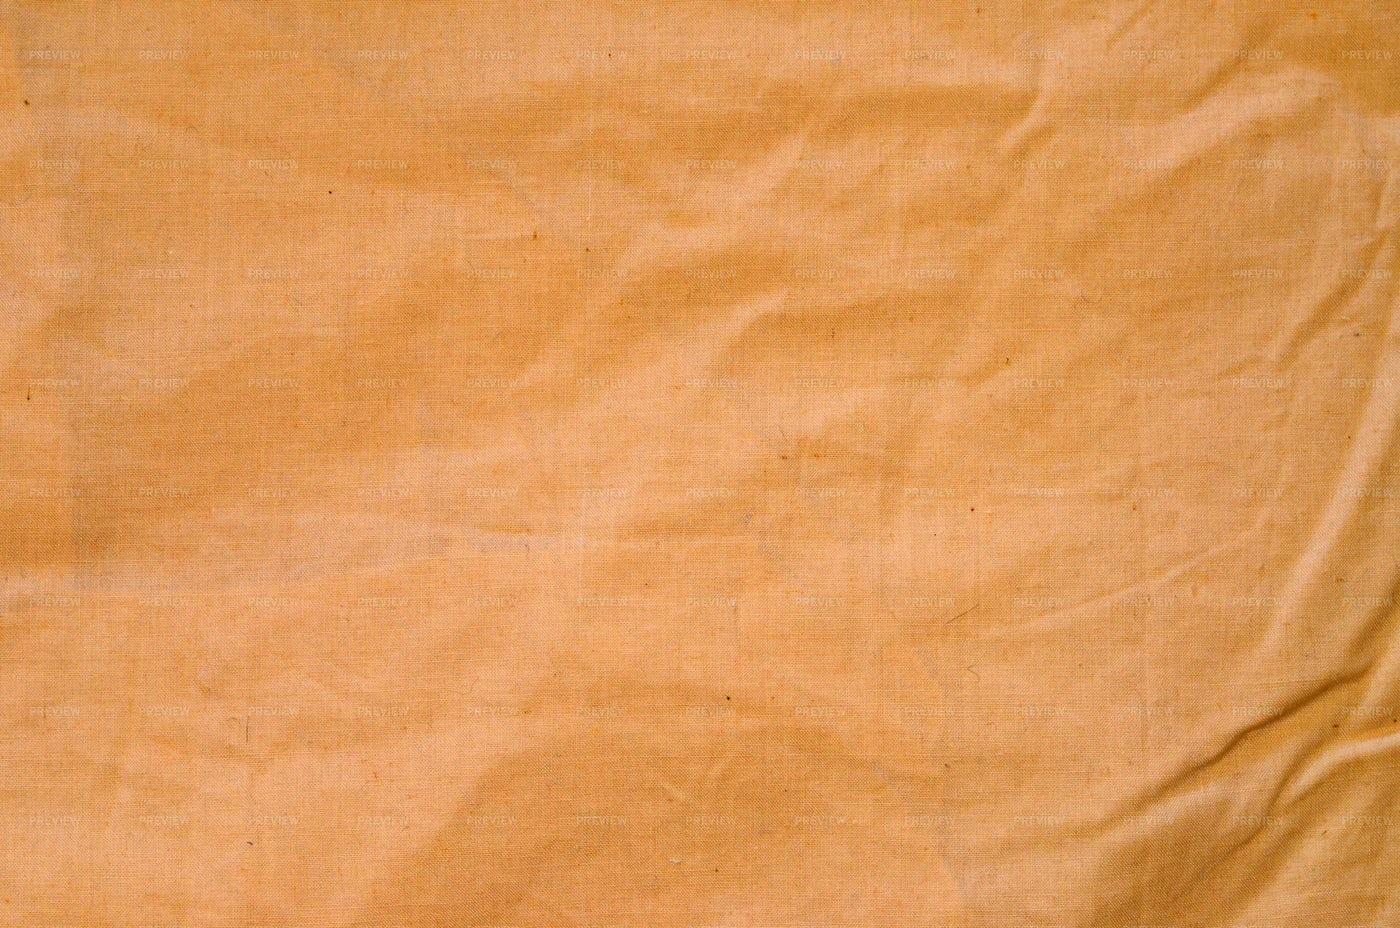 Vintage Fabric: Stock Photos